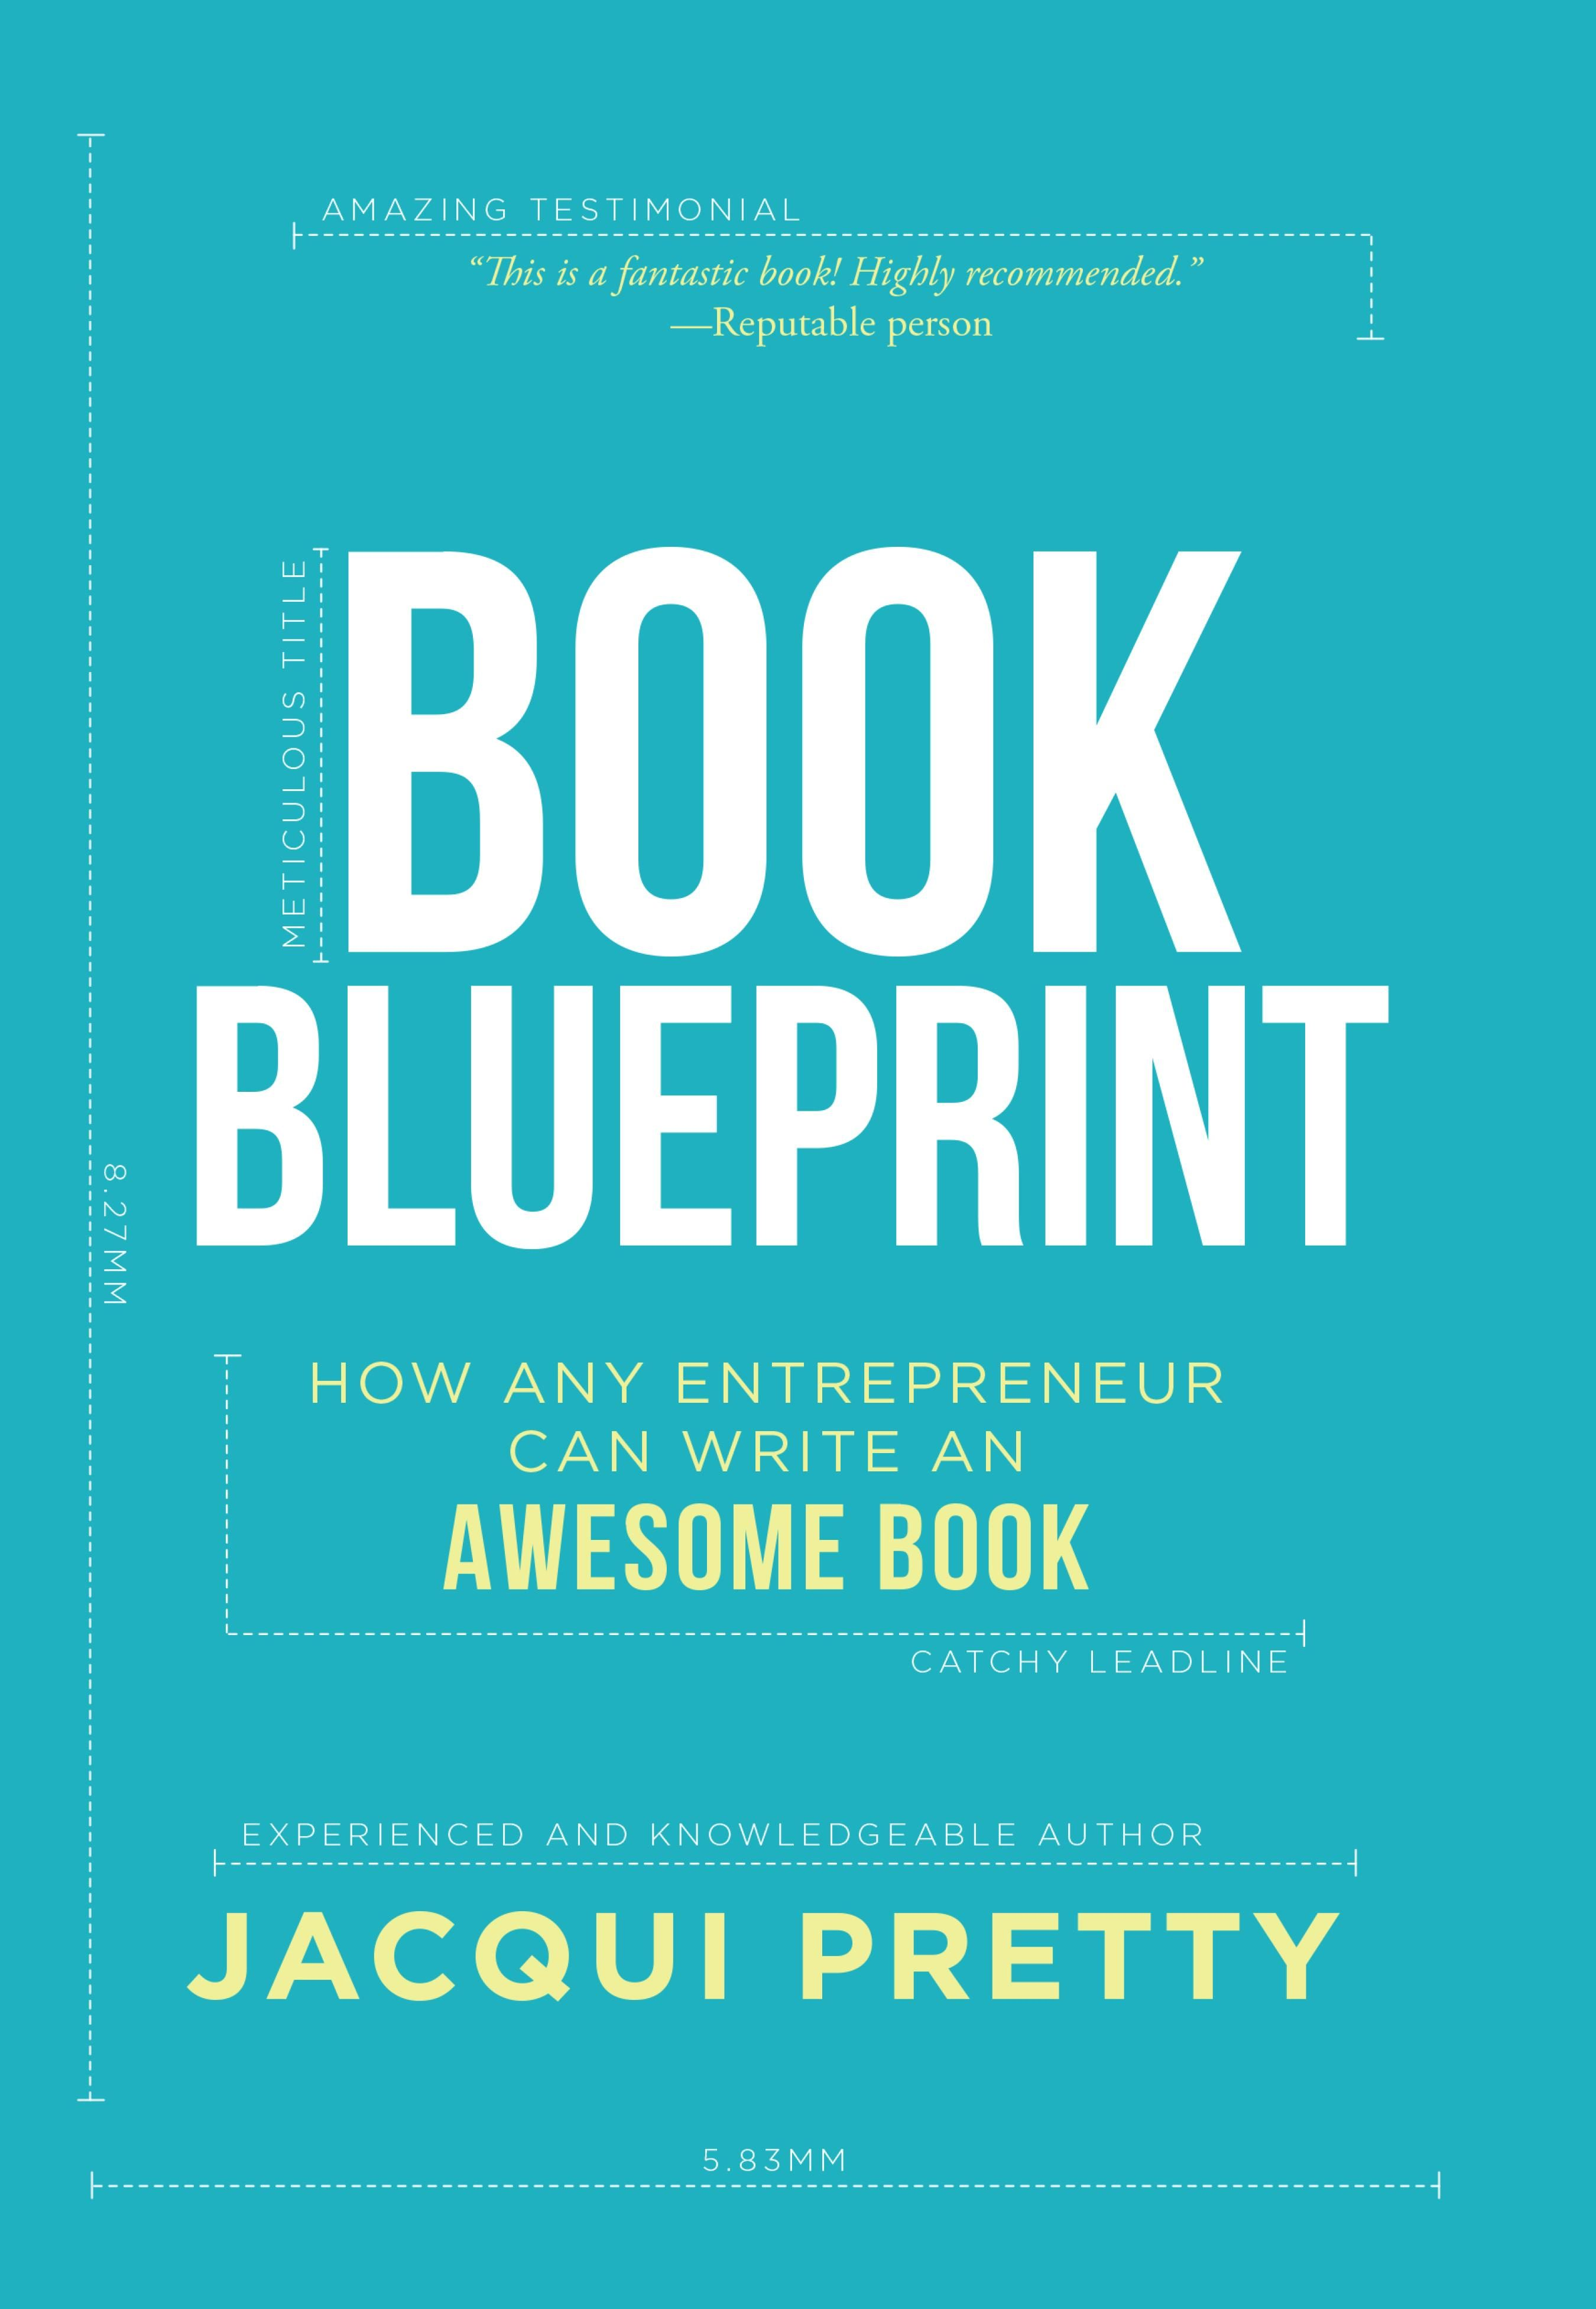 Book blueprint ebook jacqui pretty descargar libro pdf o epub book blueprint ebook jacqui pretty 9780994405531 malvernweather Image collections